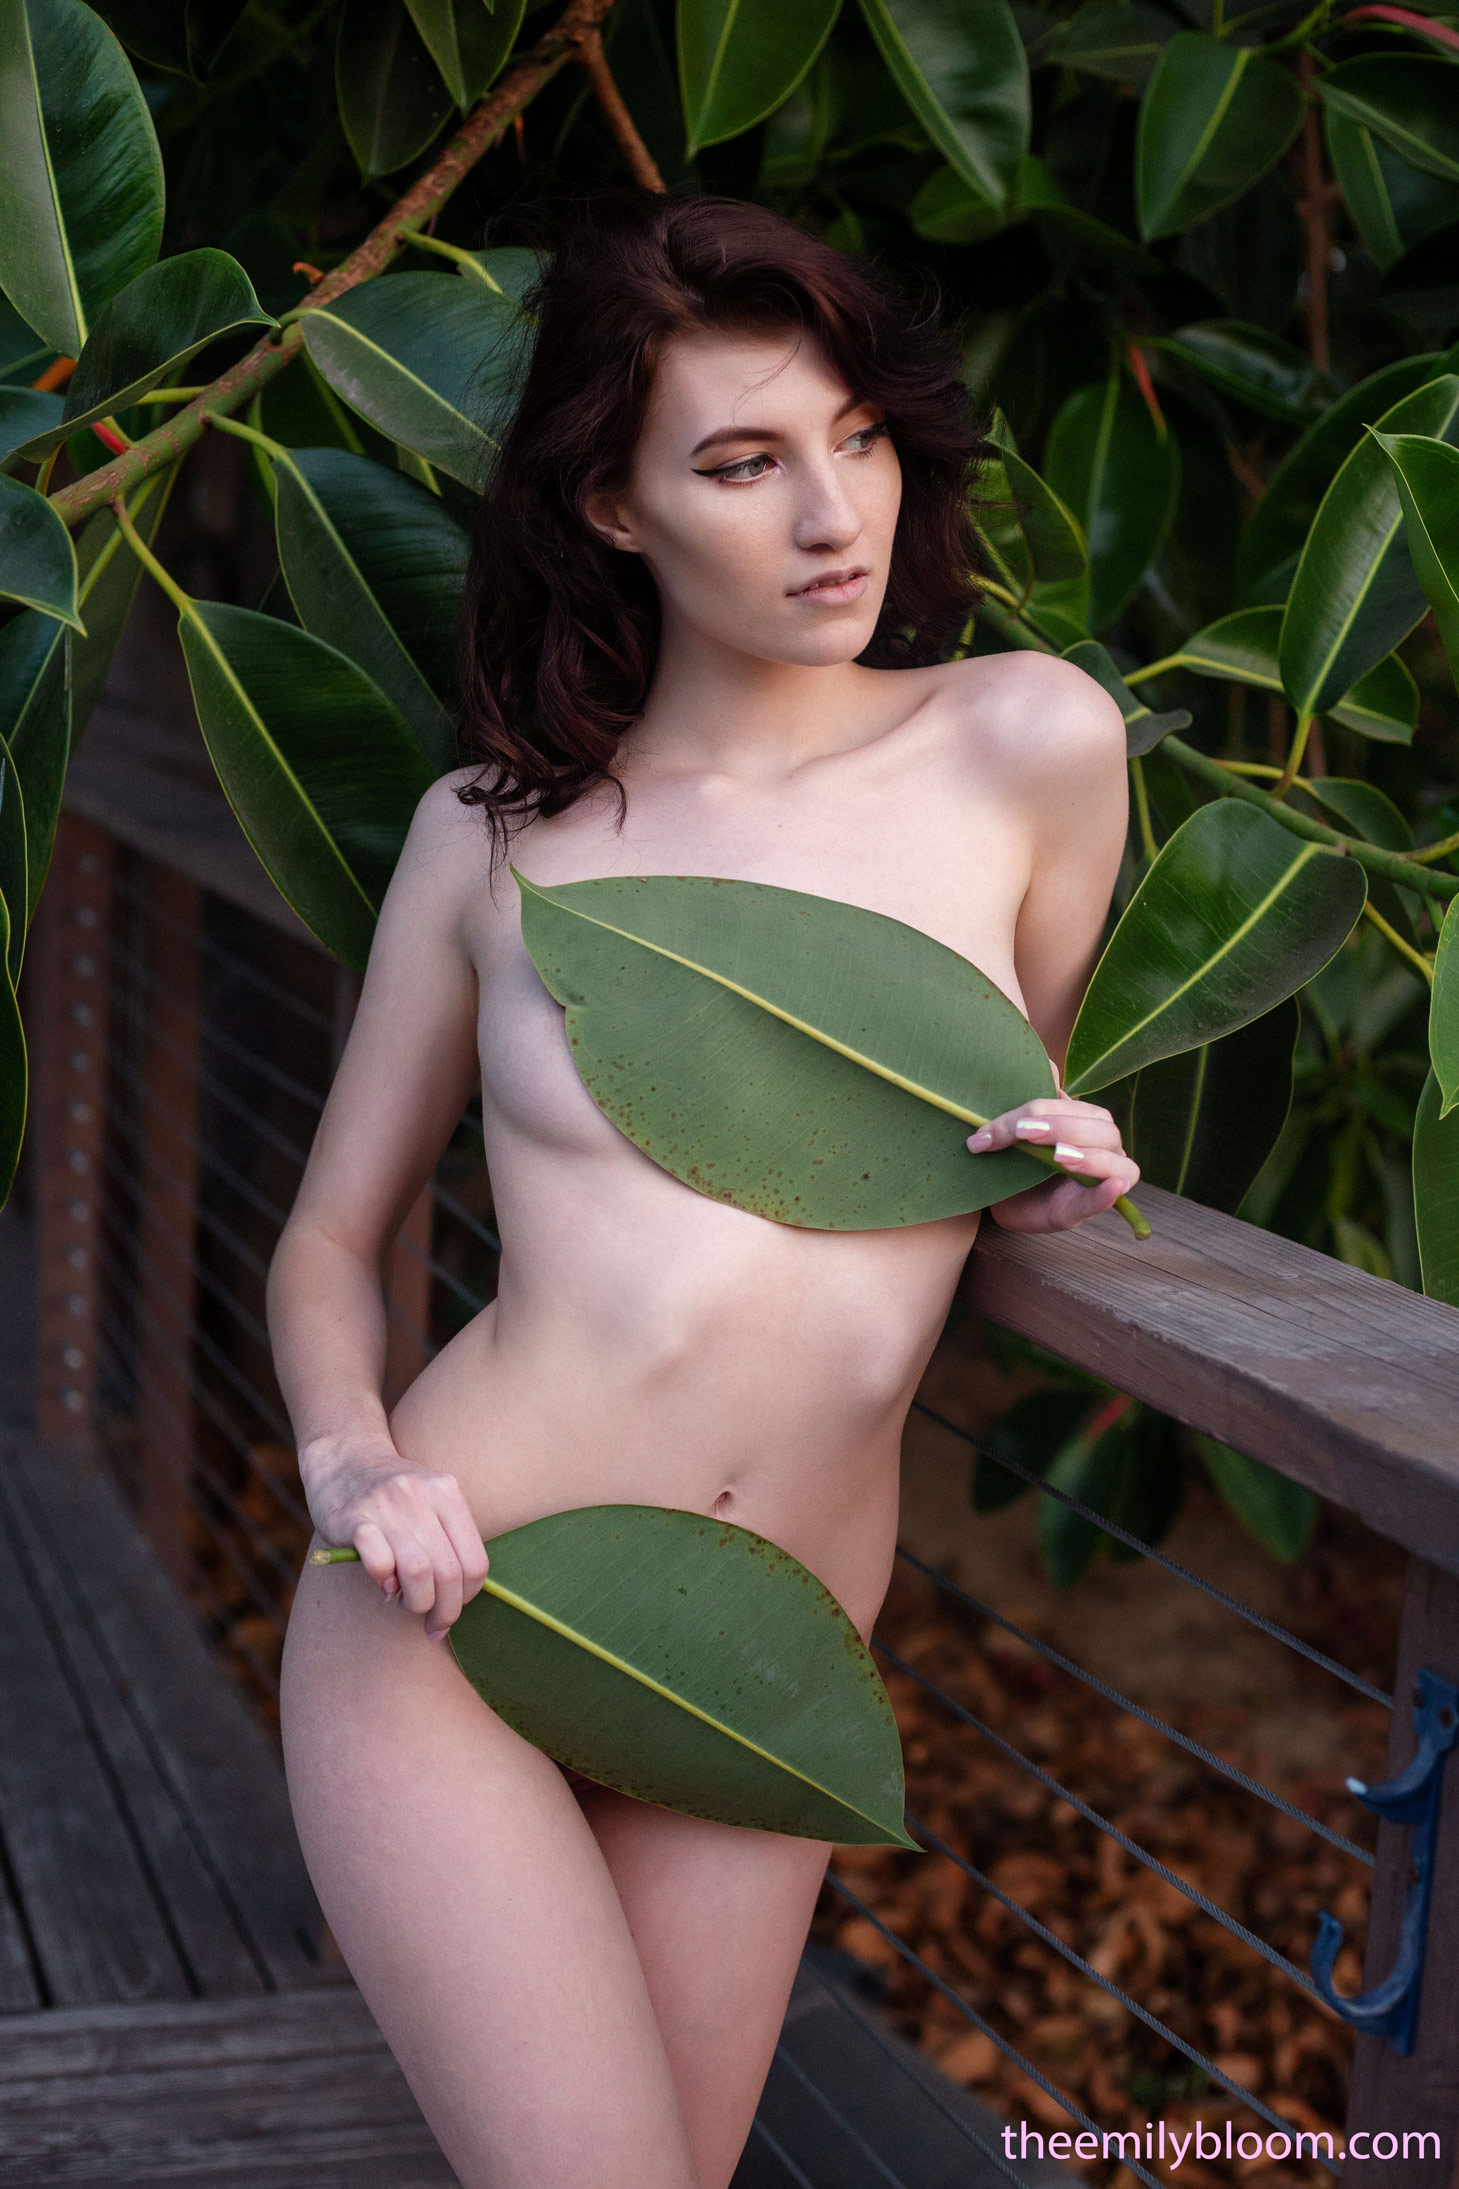 Nude girl with kitten